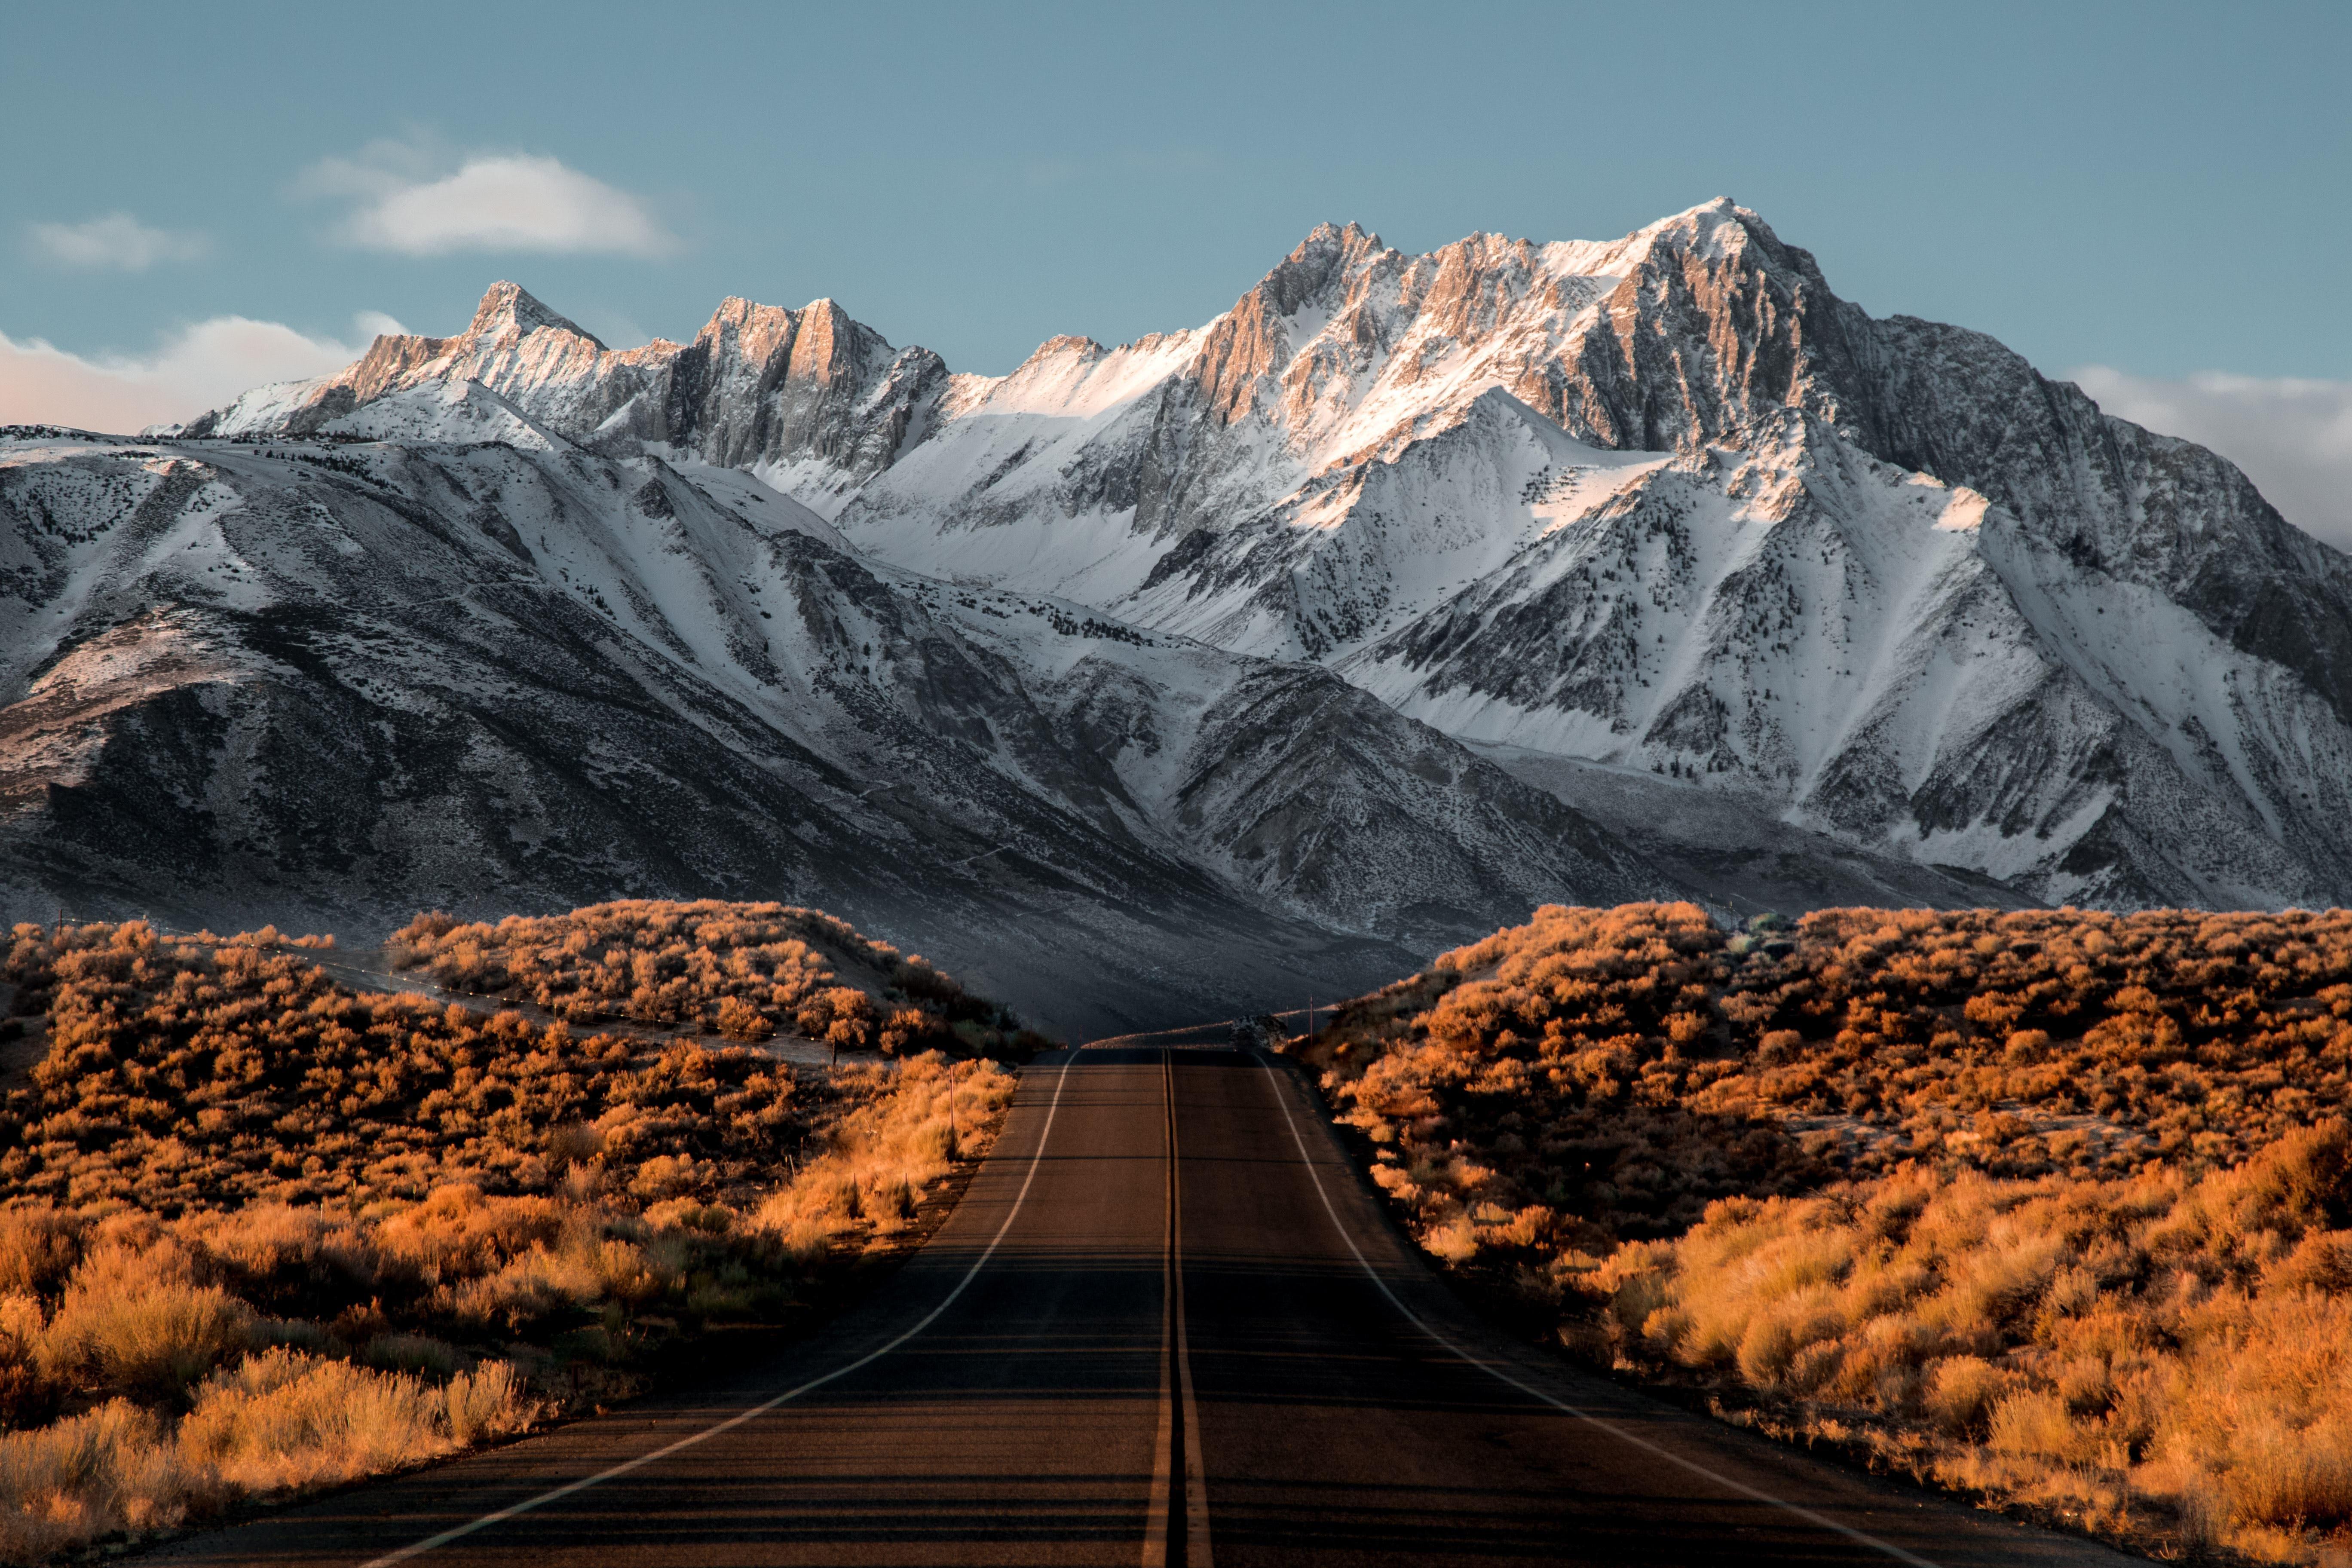 Sierra nevada 4k wallpaper - Nevada wallpaper hd ...